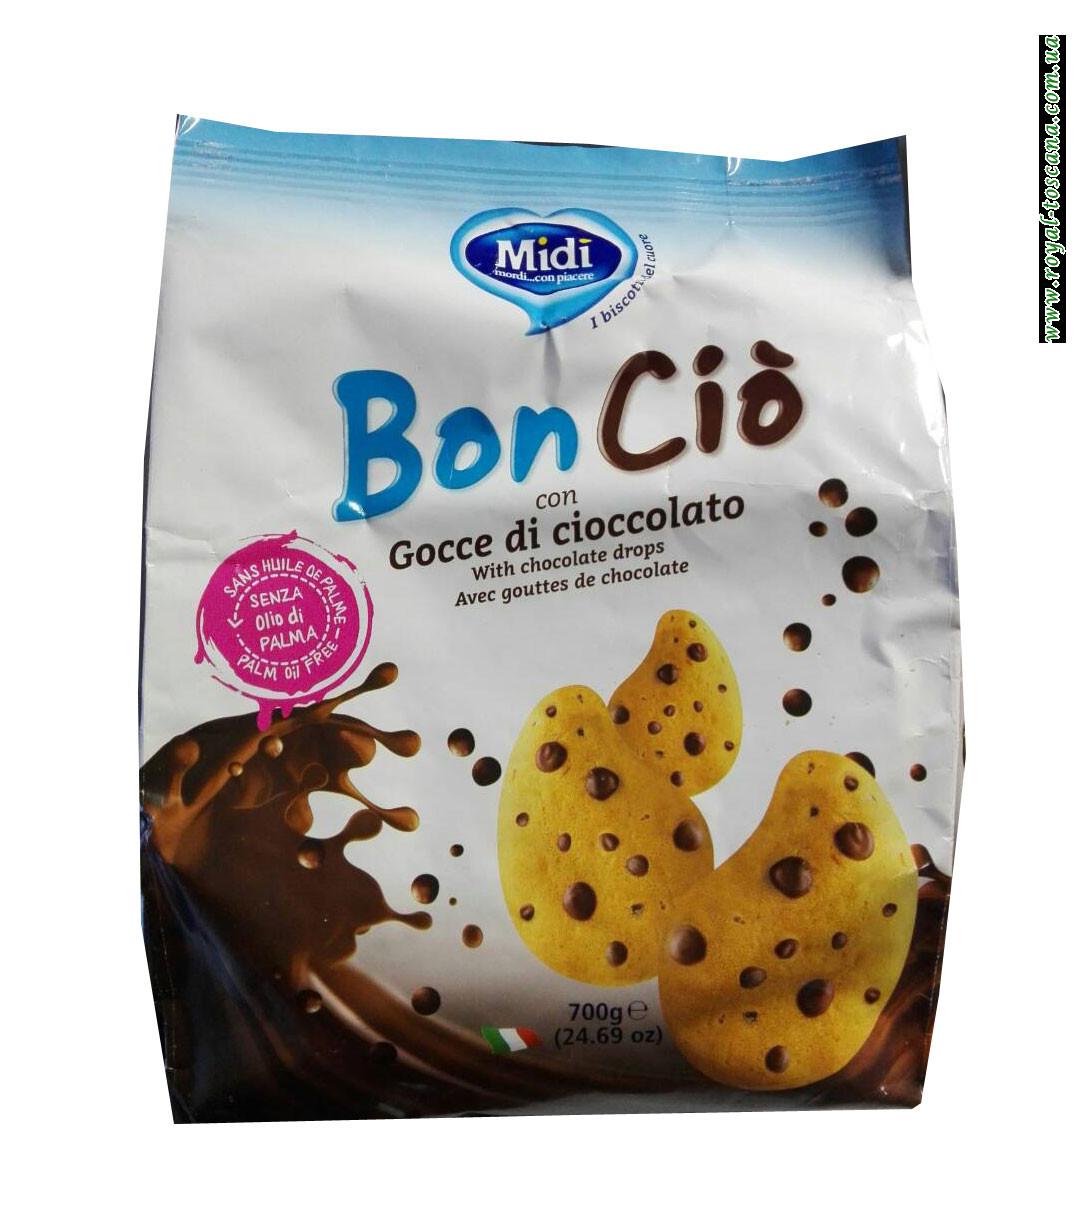 Печенье Midi Bon Cio con Gocce di Cioccolato